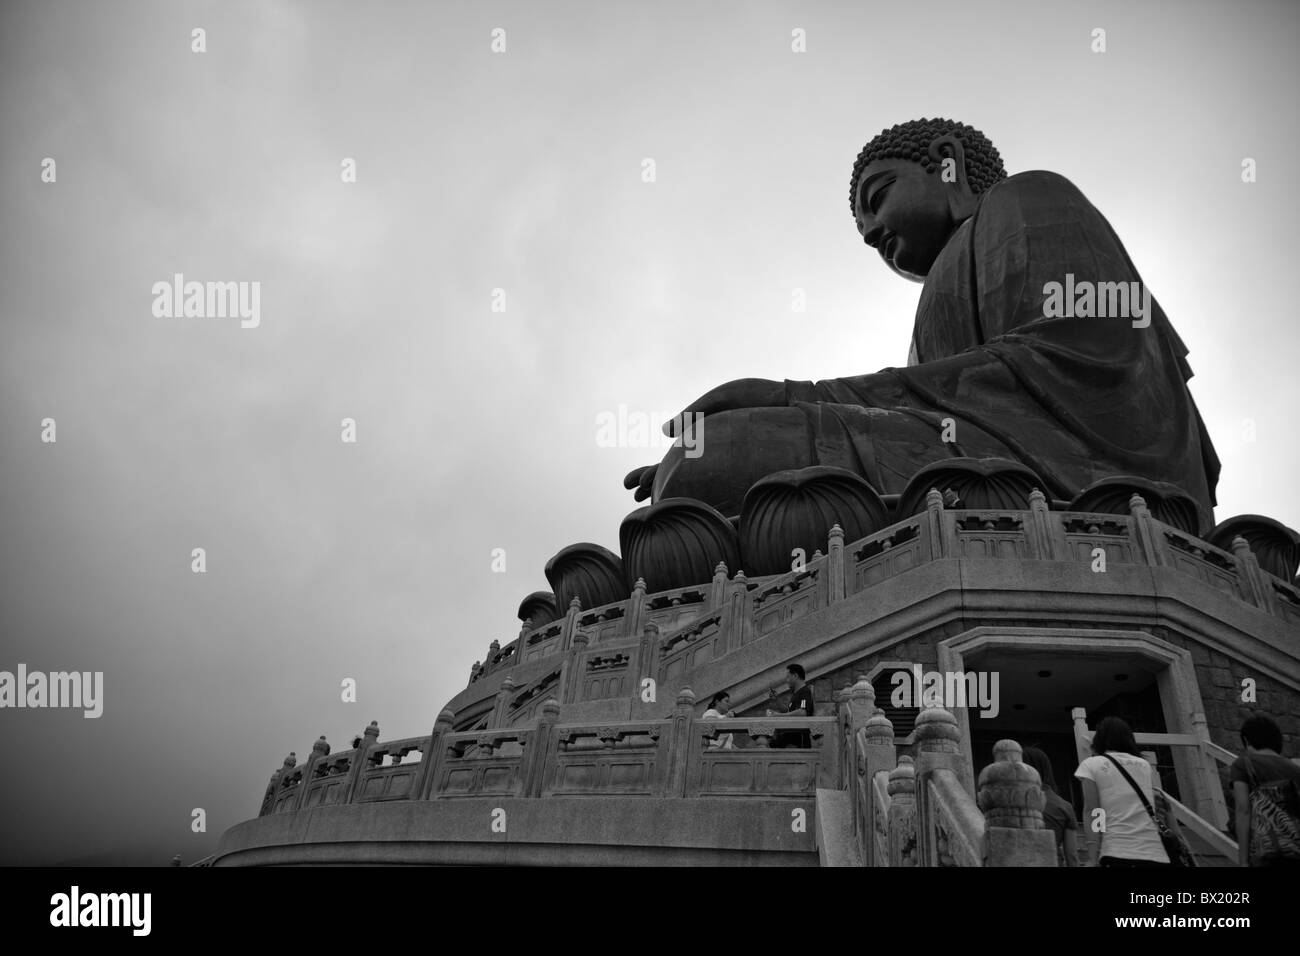 Hong Kong, Lantau island seated bronze statue the Big Buddha Lantau Buddha, Lantau Big Buddah, Lantau island, Lantau - Stock Image